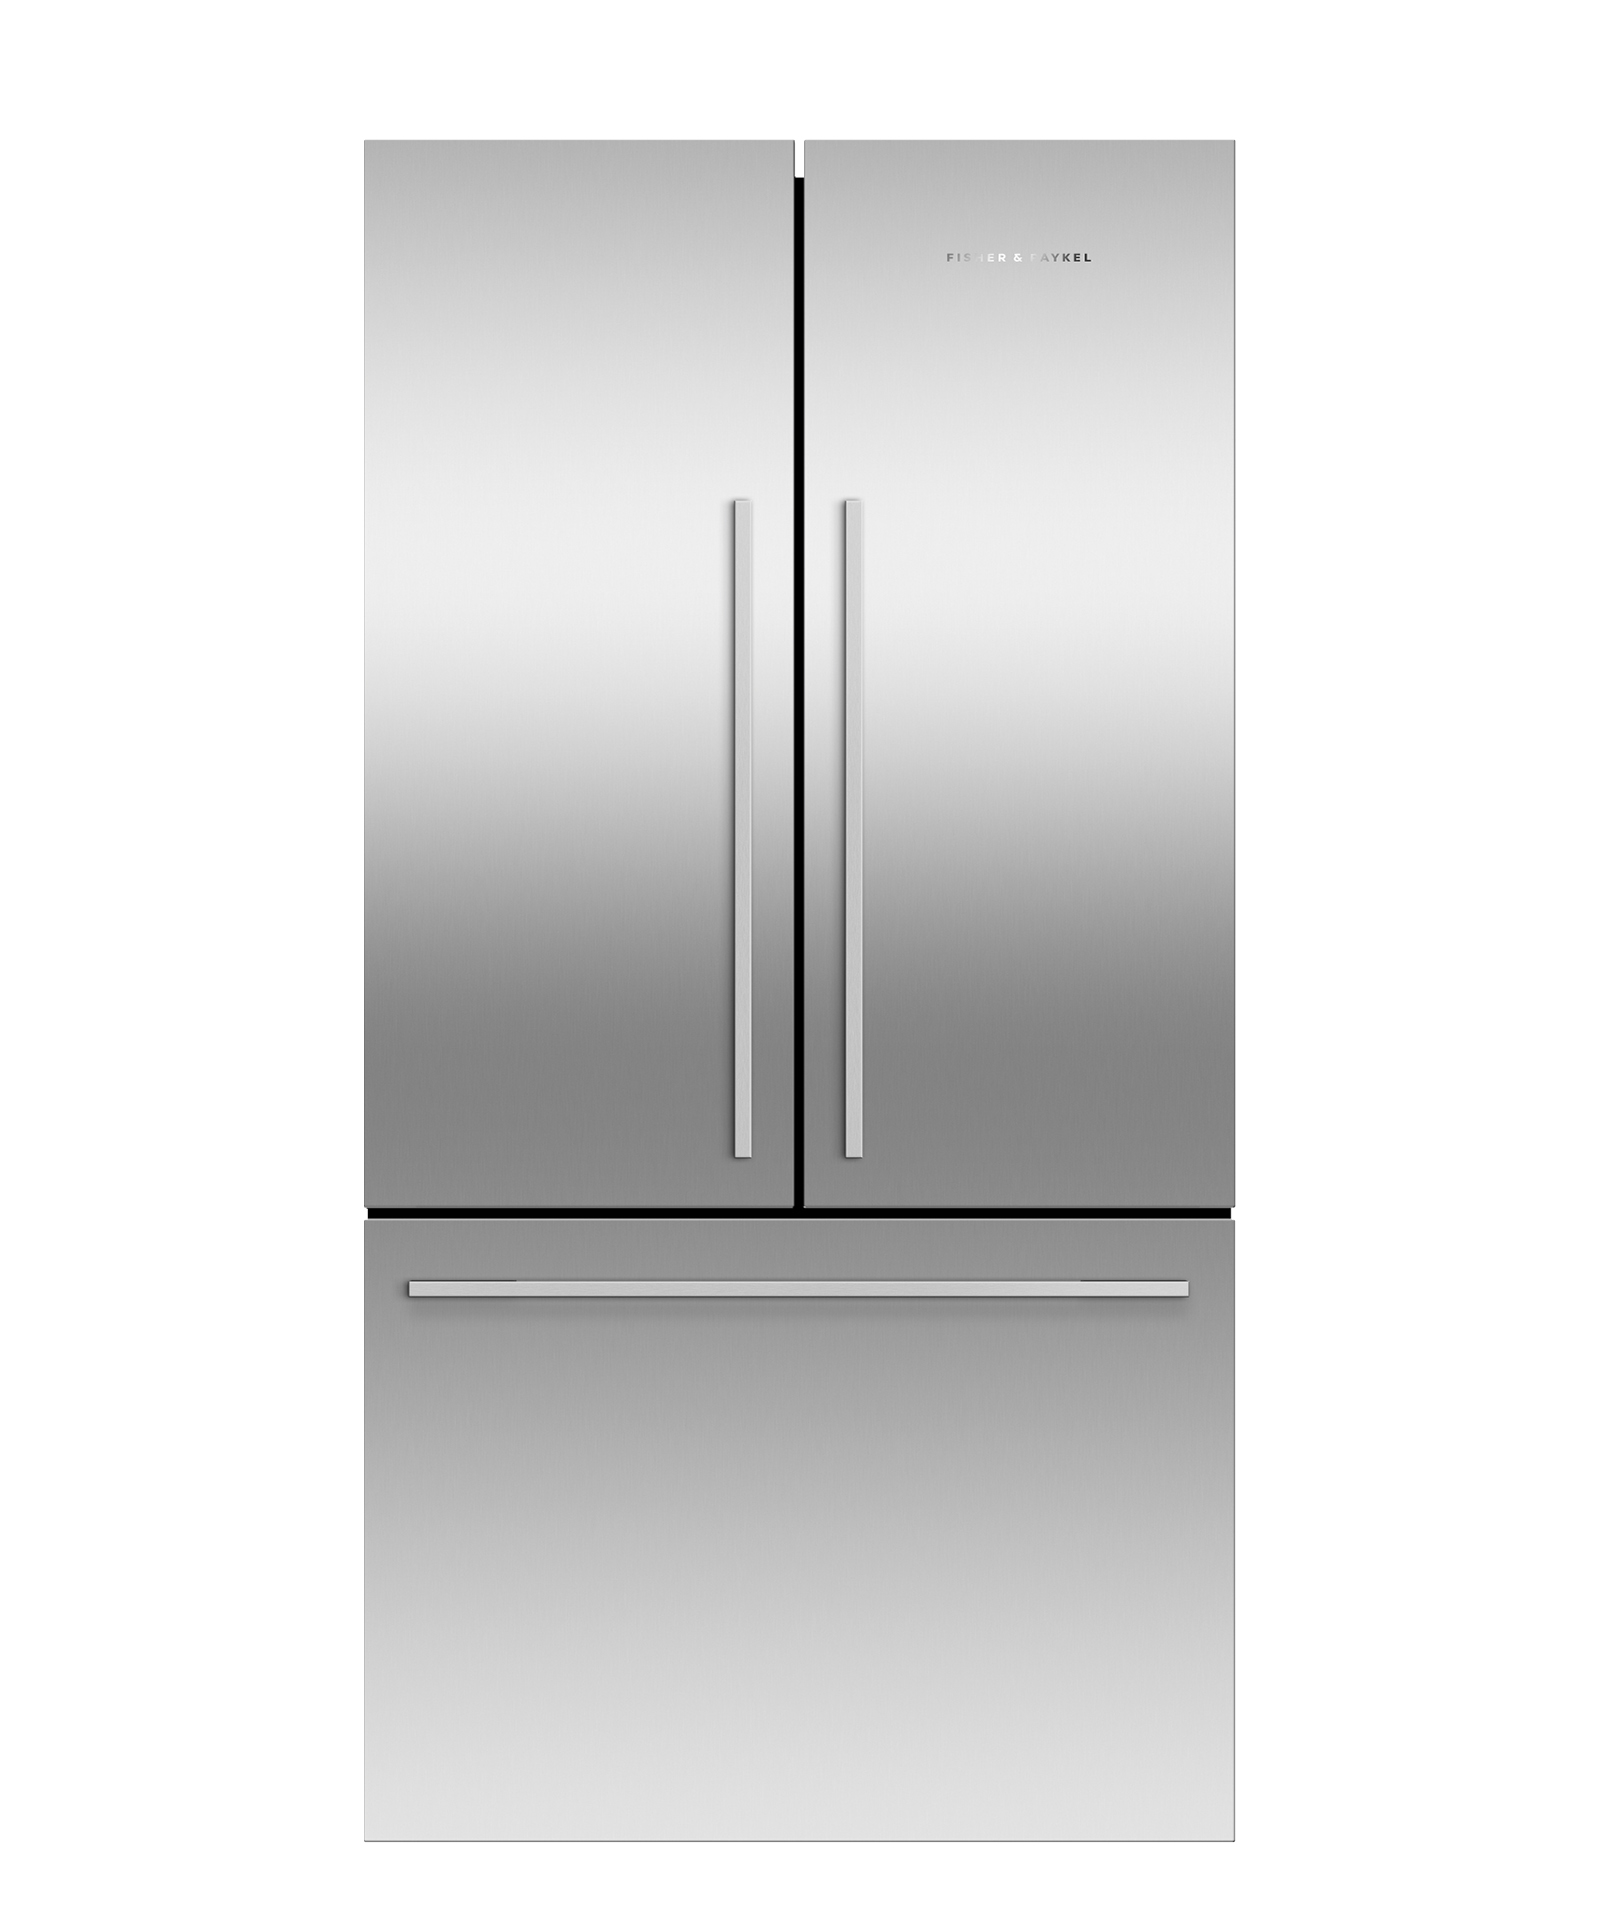 RF170ADX4 French Door Refrigerator 17 cu ft Fisher Paykel US